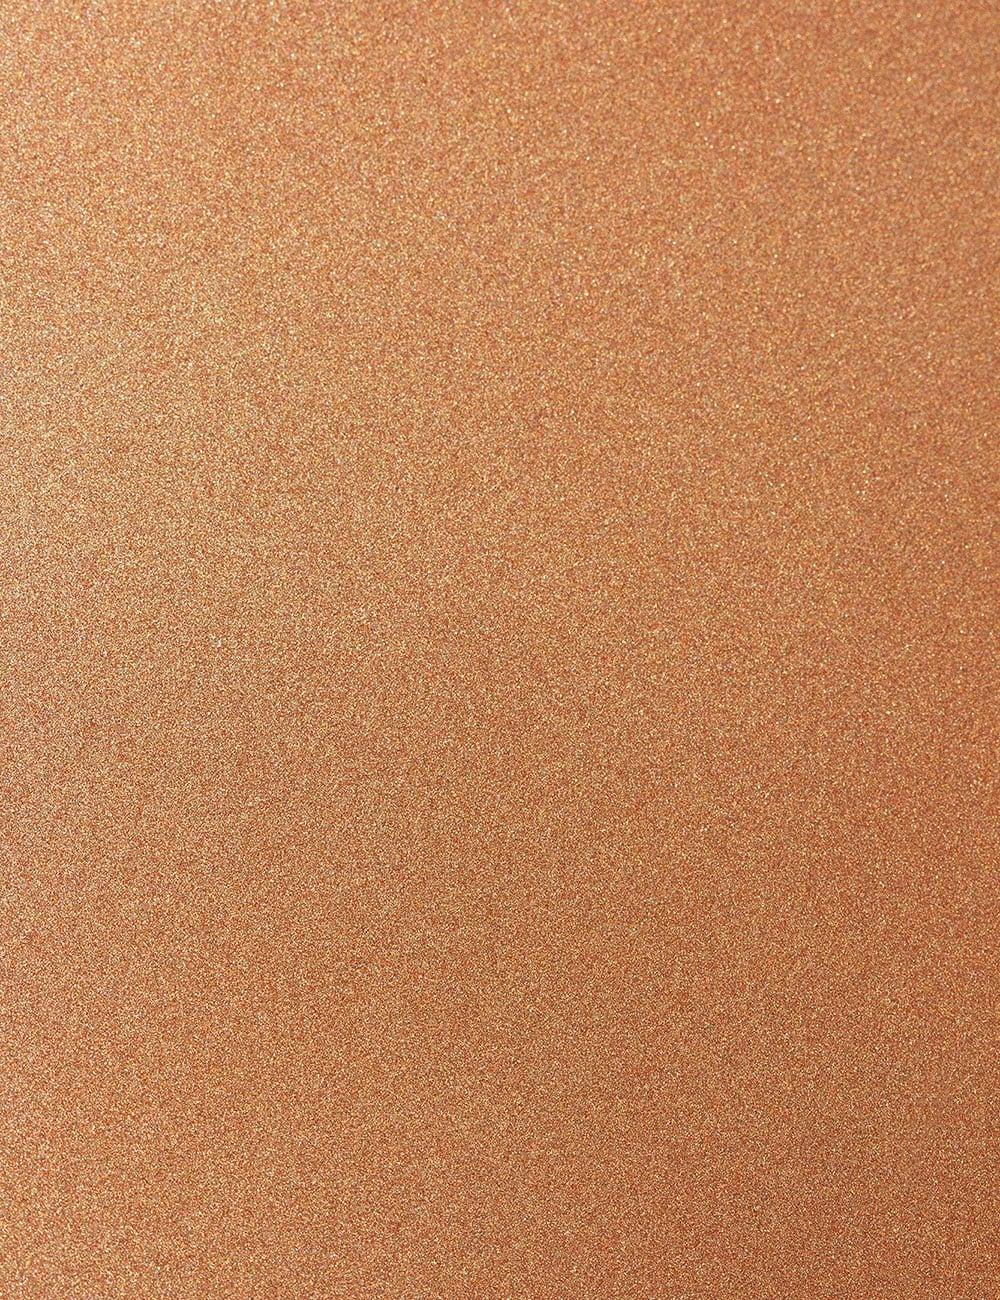 Montana Gold Copper Metallic Effect Spray Paint 400ml Spray